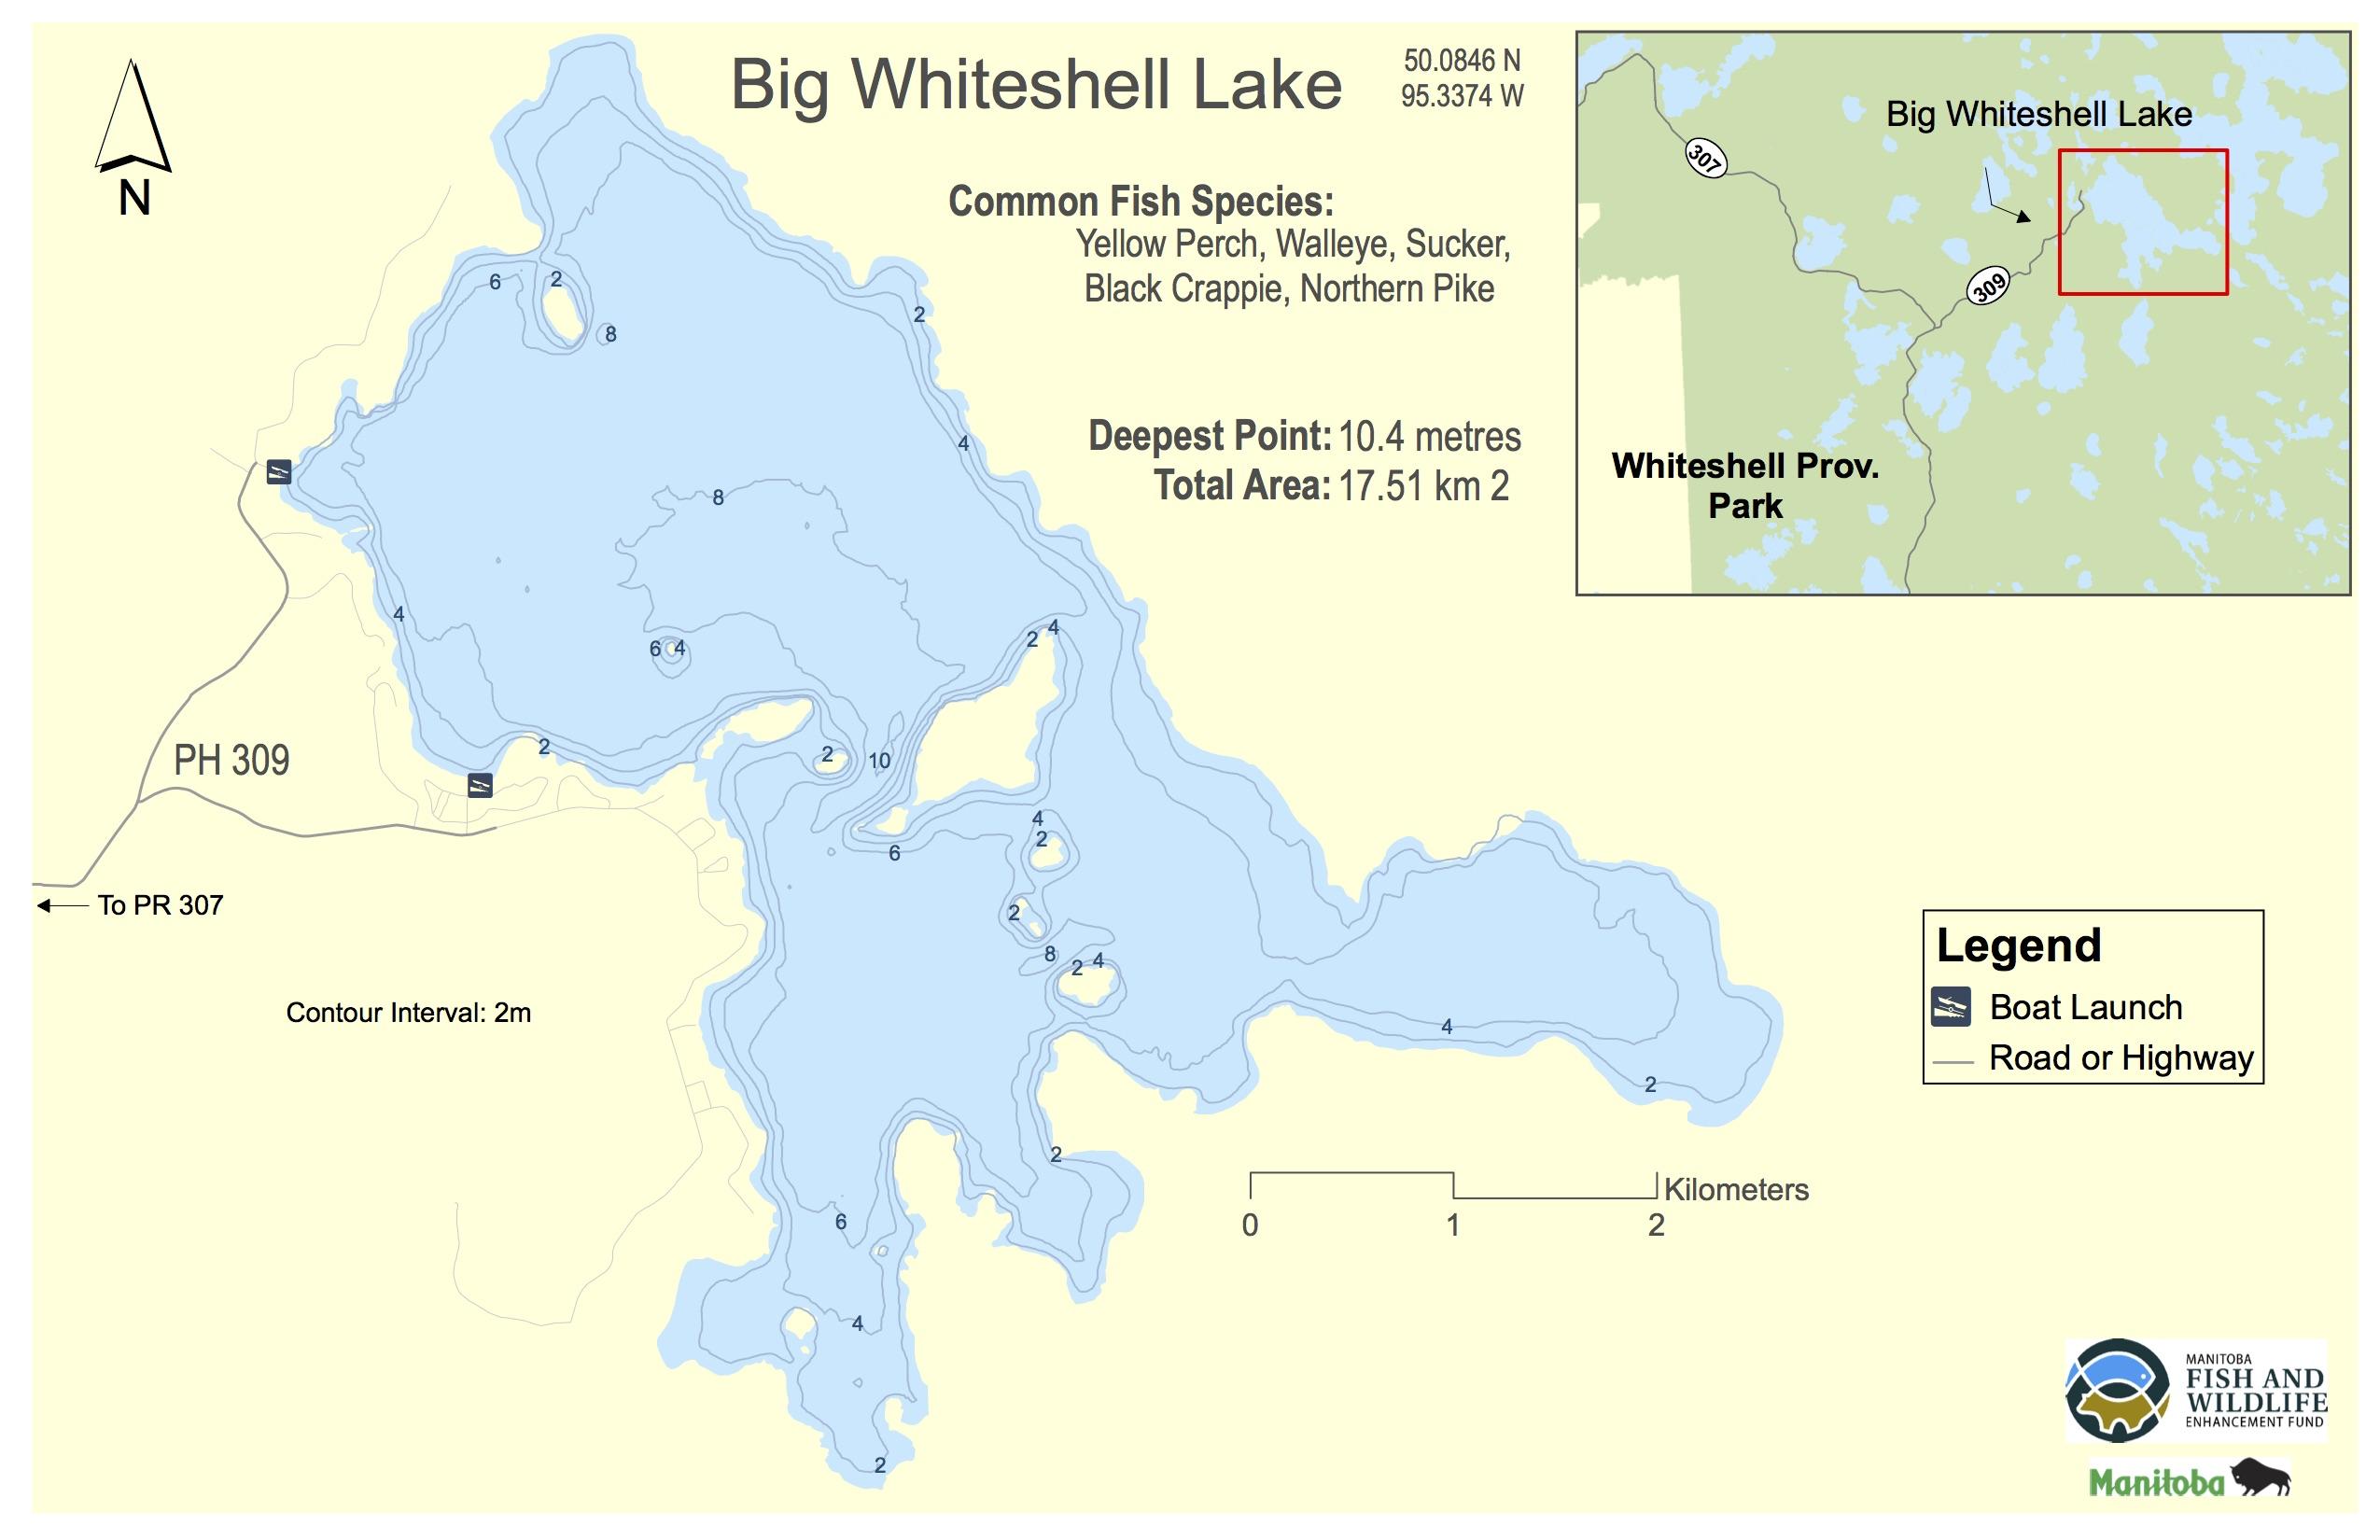 Big Whiteshell Lake, Manitoba | Angler's Atlas